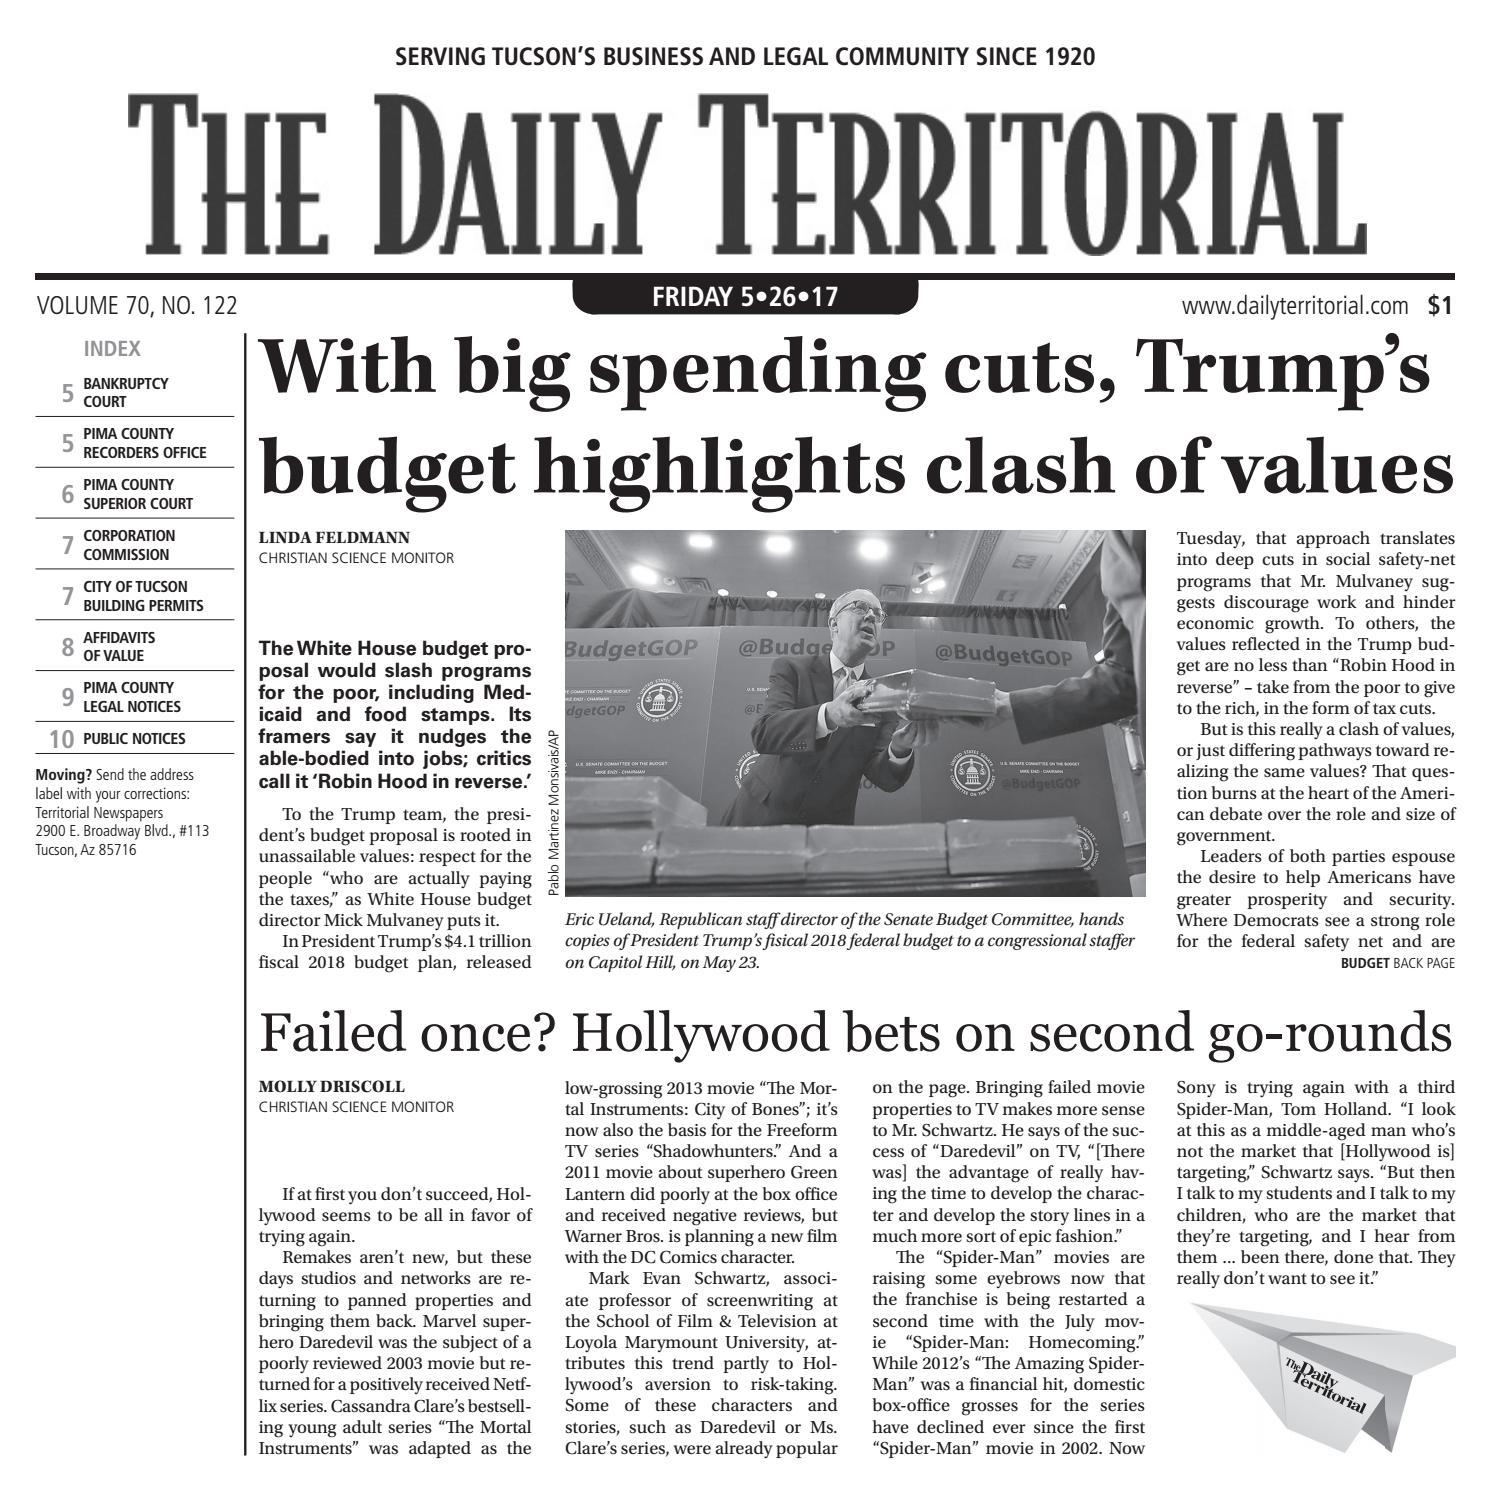 Trump Budget Will Slash Medicaid Food Stamps Programs